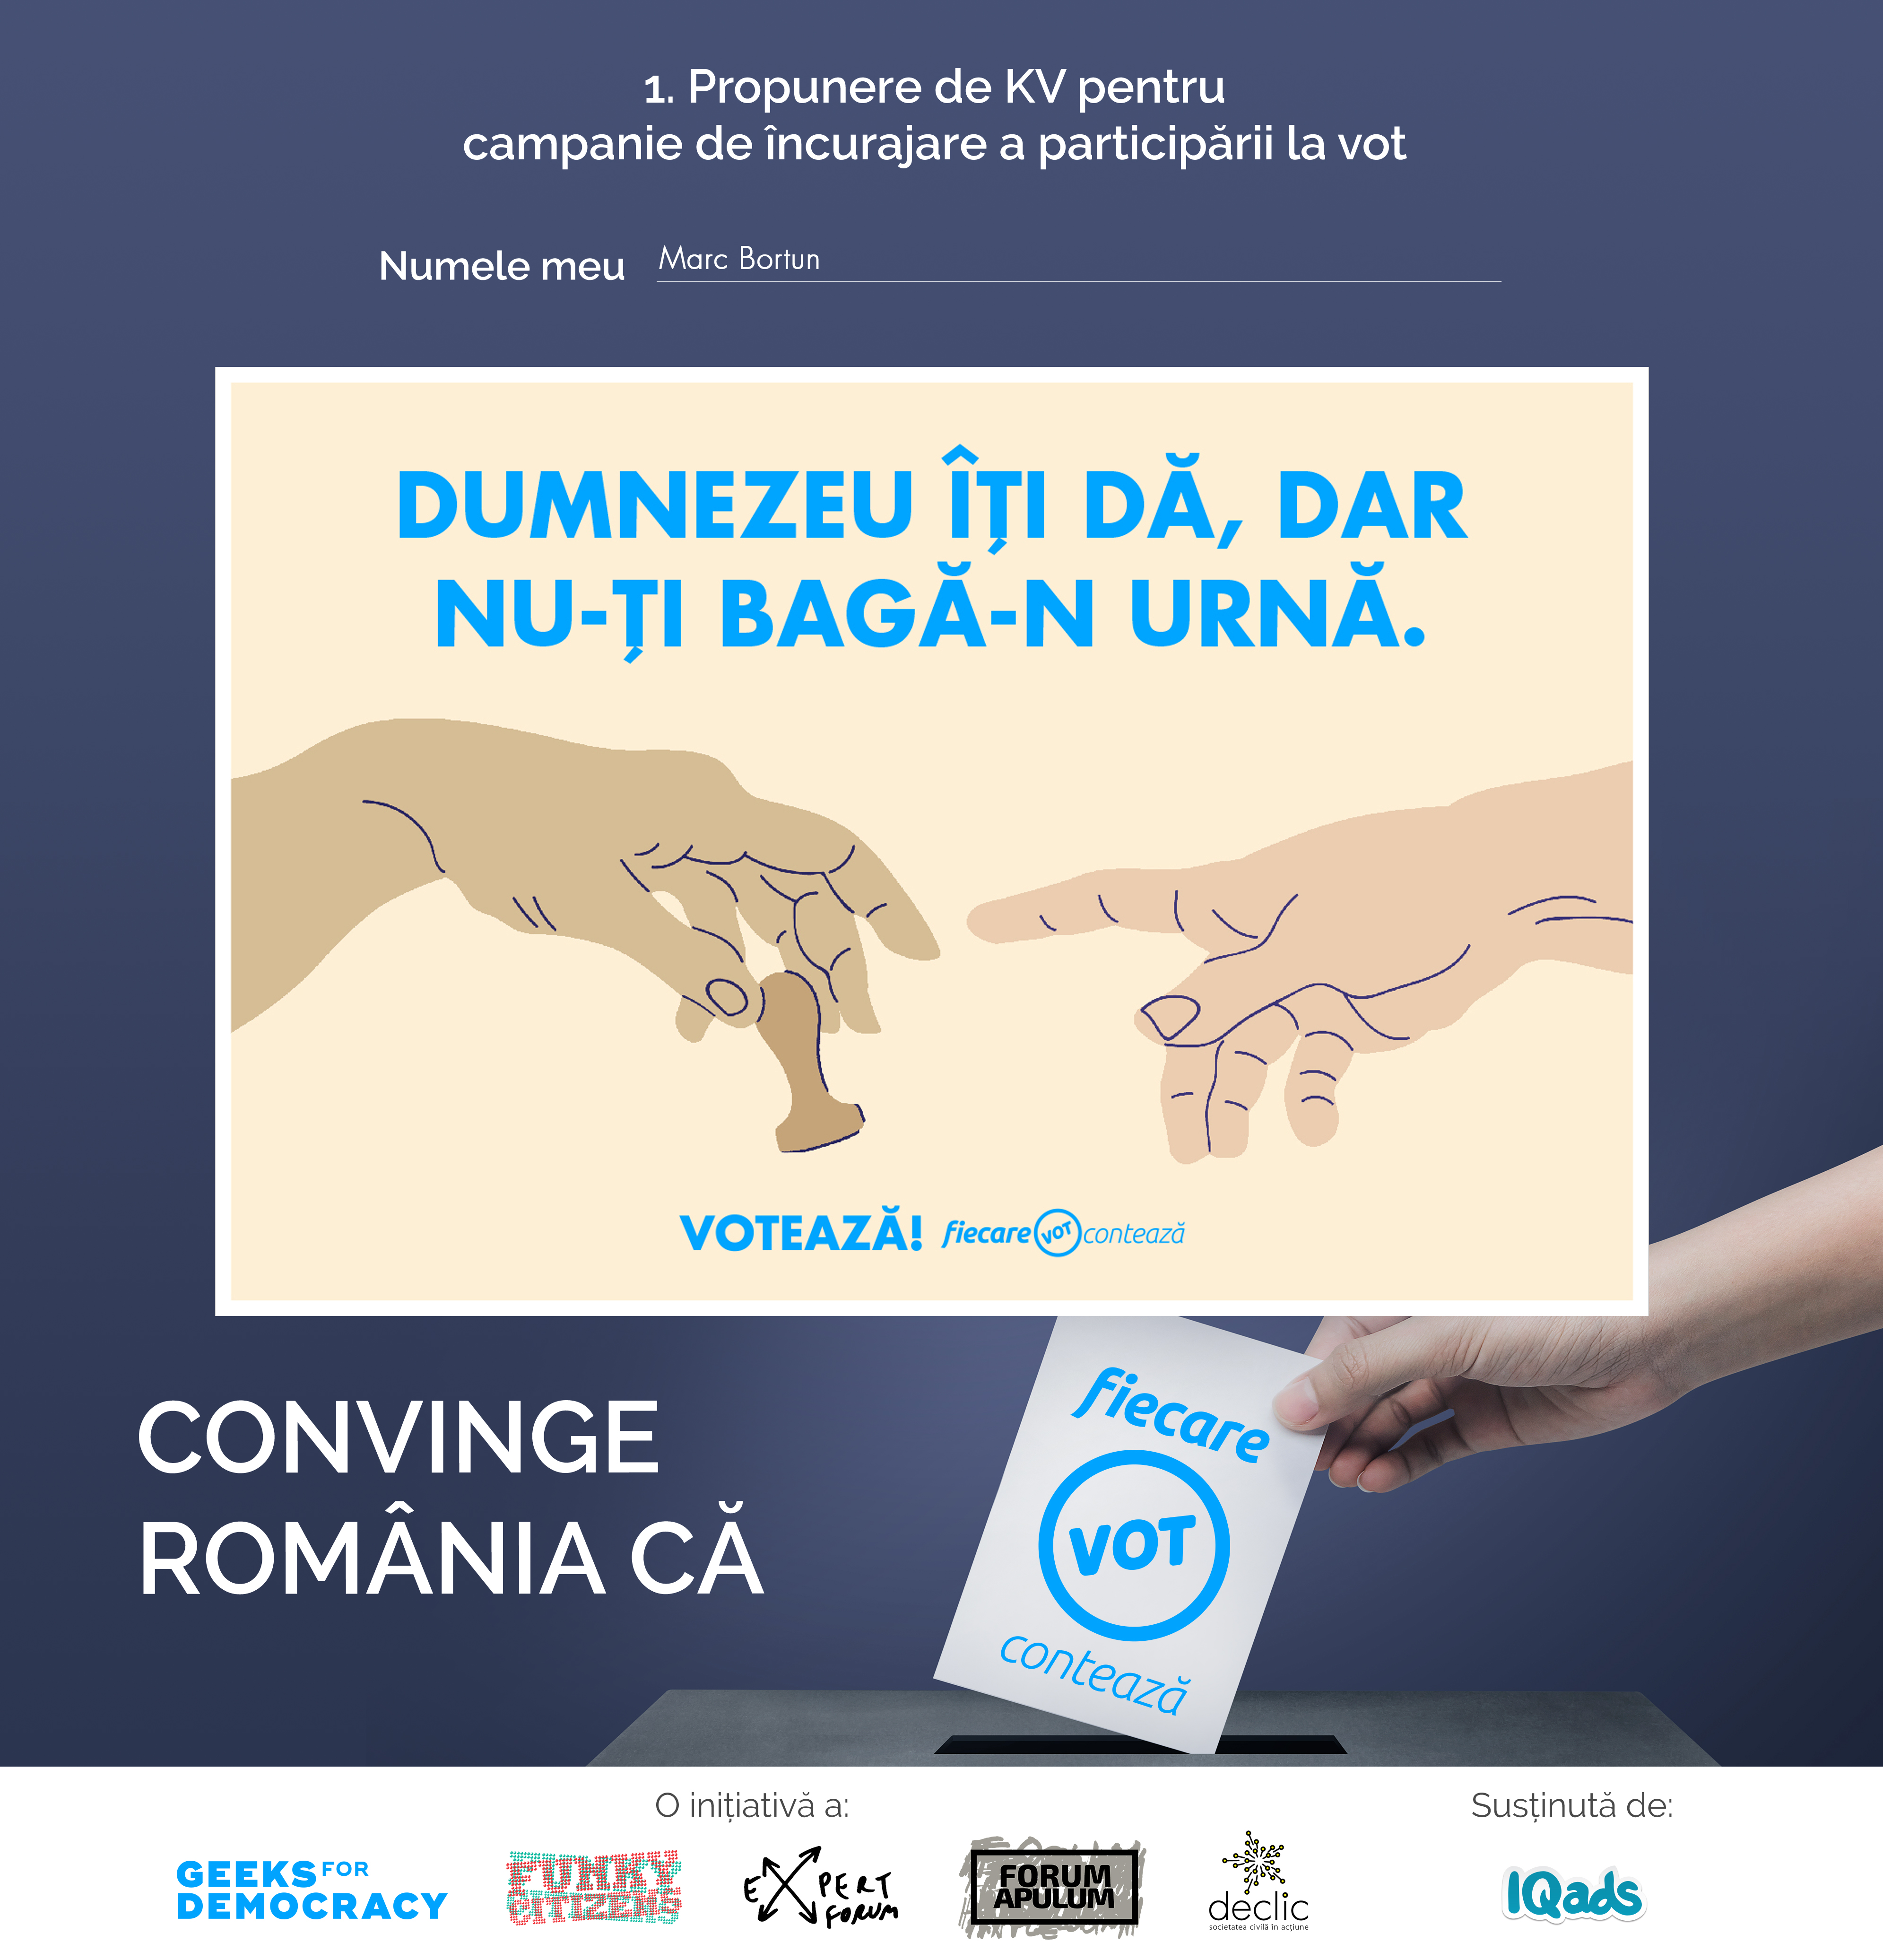 Convinge Romania Ca Fiecare Vot Conteaza